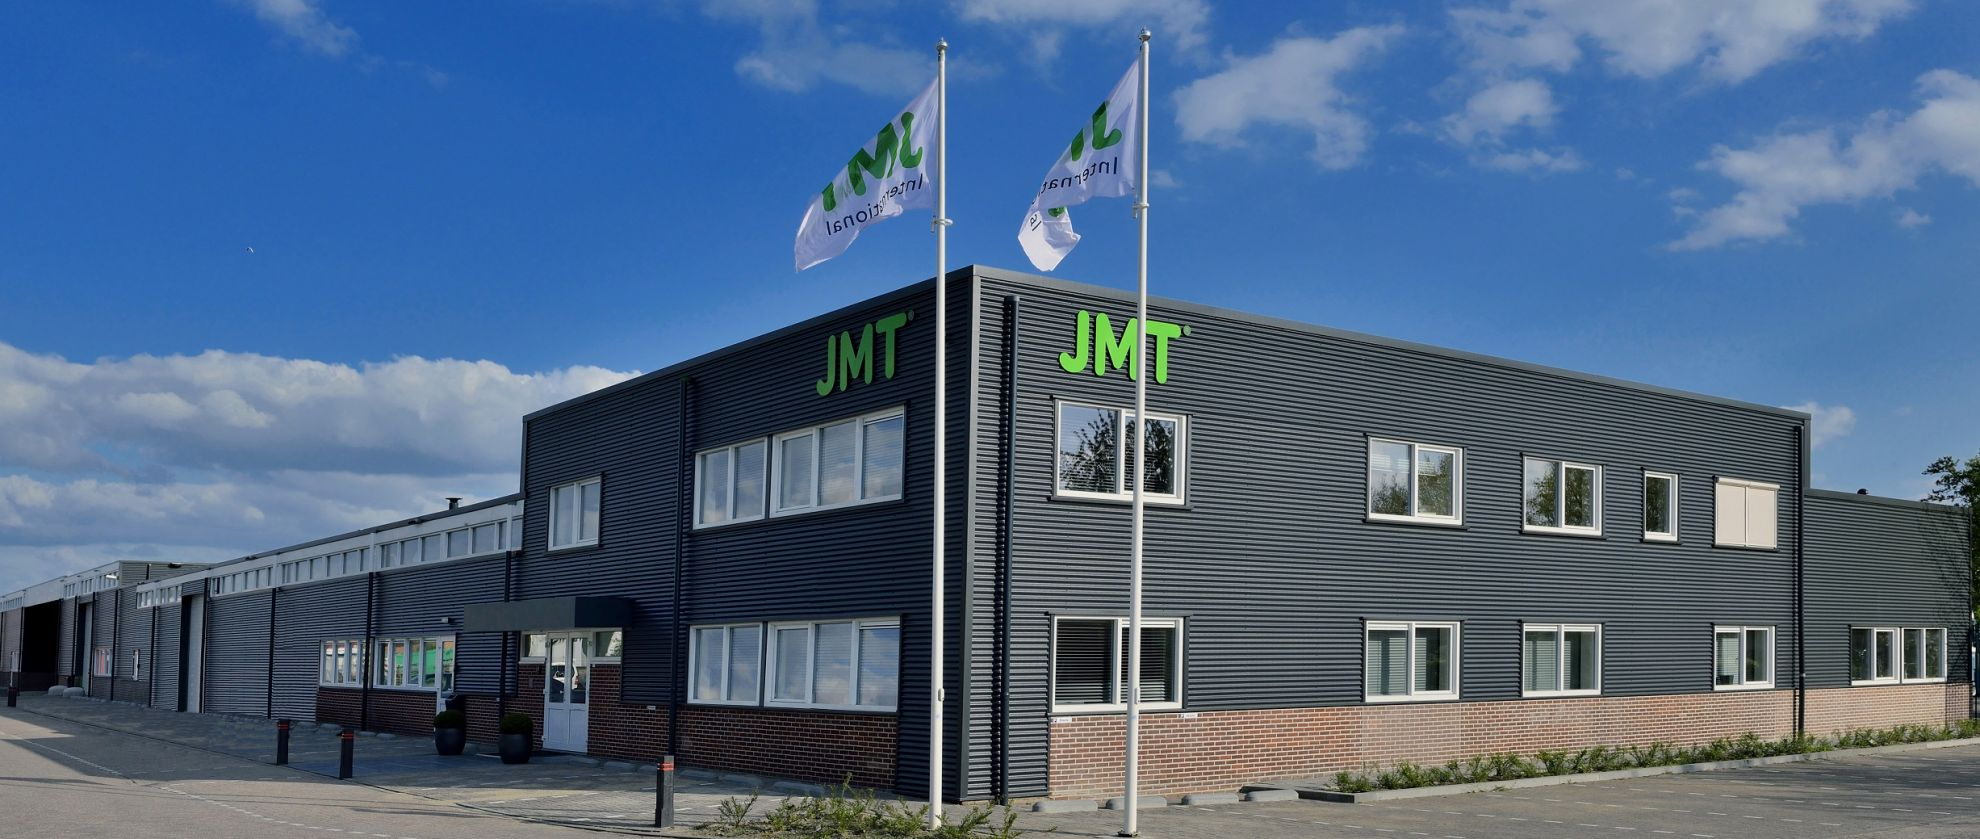 Work at JMT | JMT